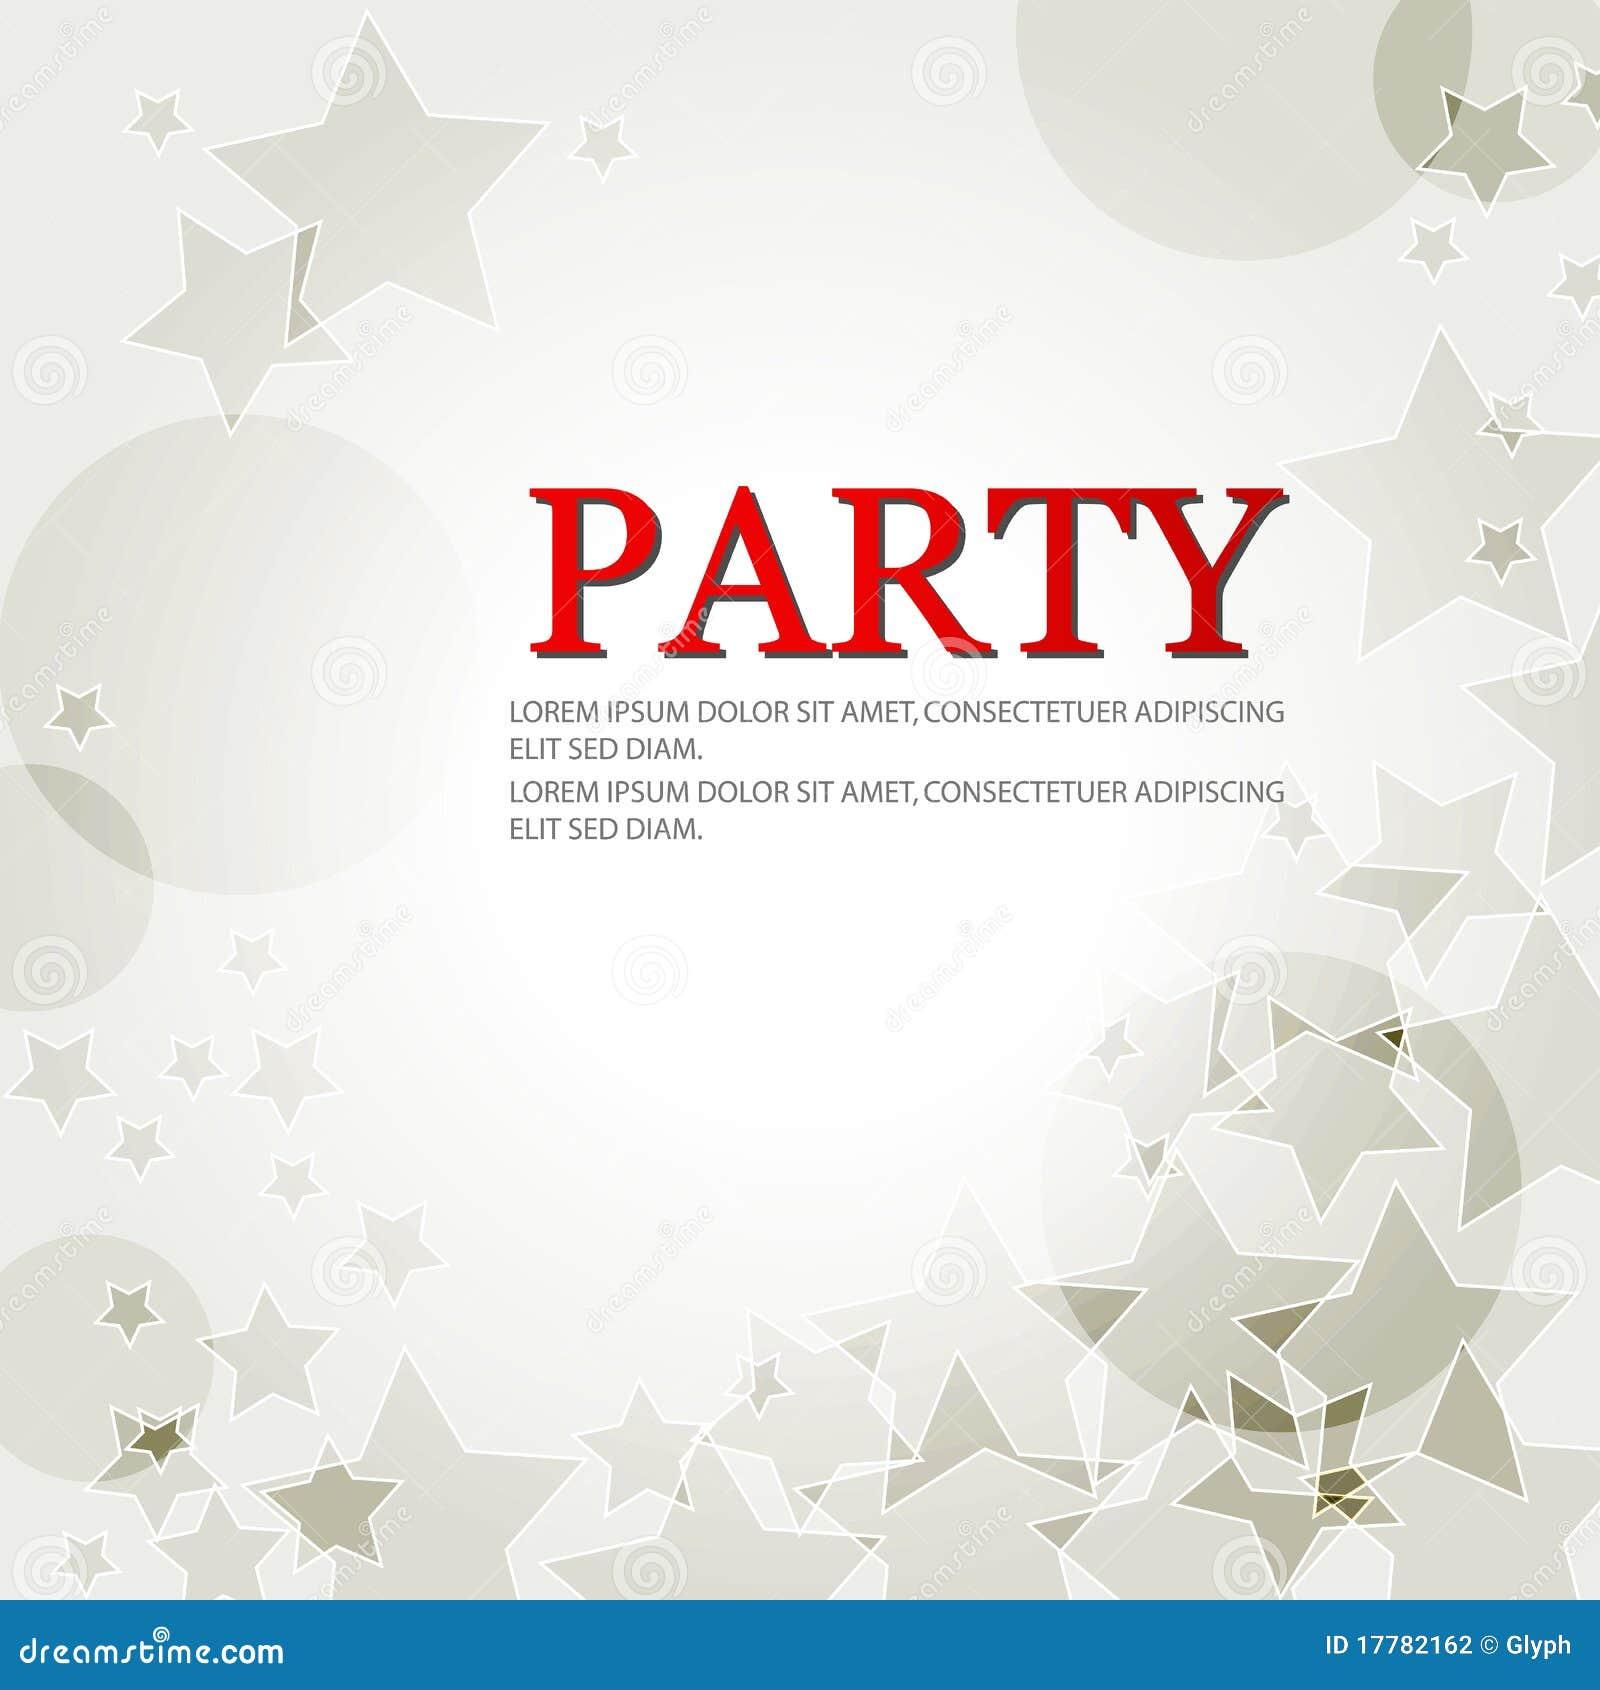 Elegant Birthday Backgrounds : Elegant Party Background With Stars Stock Photography - Image ...